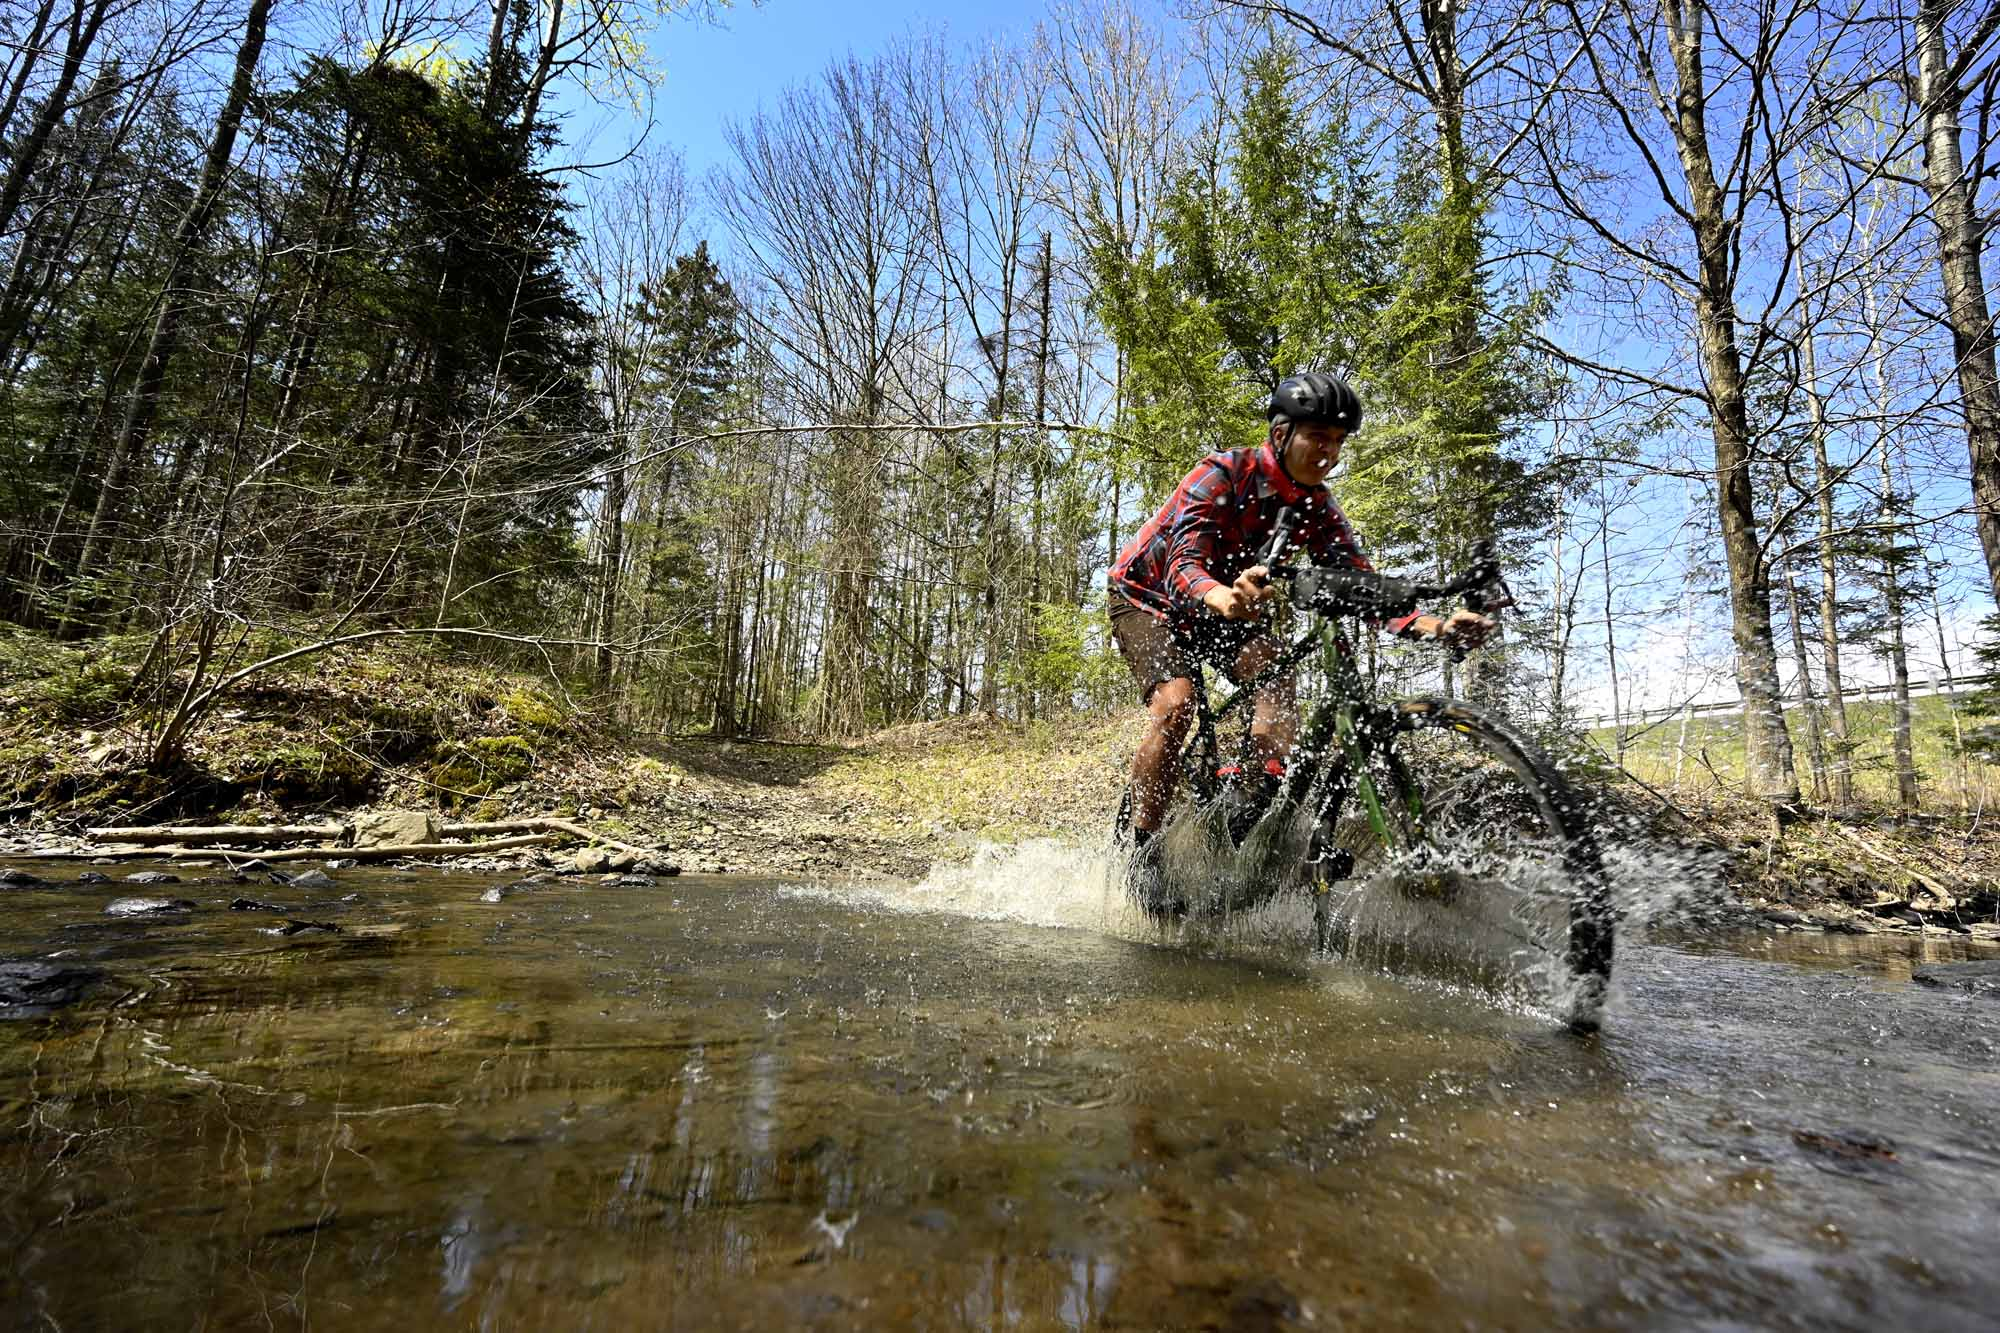 Gravel-Bandits-Gang-de-la-Garnotte-Bromont-Cyclists-Shun-Pavement-Bernard-Brault-bike-in-water